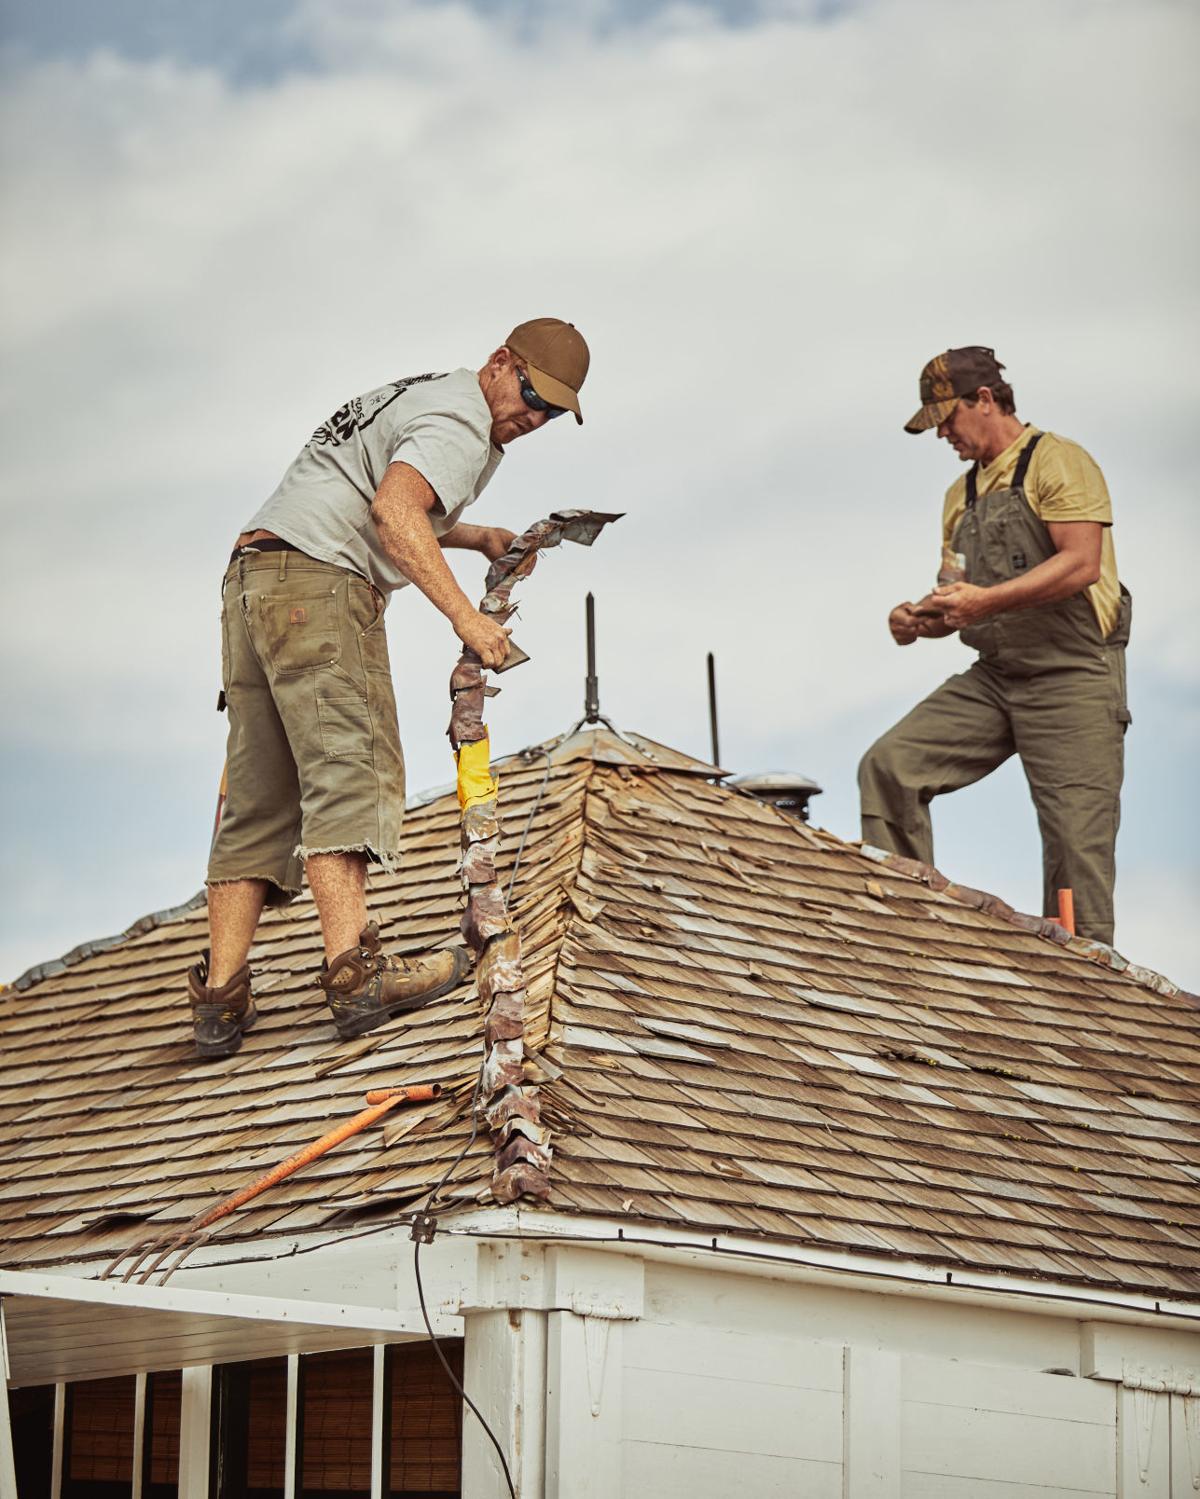 Roof work